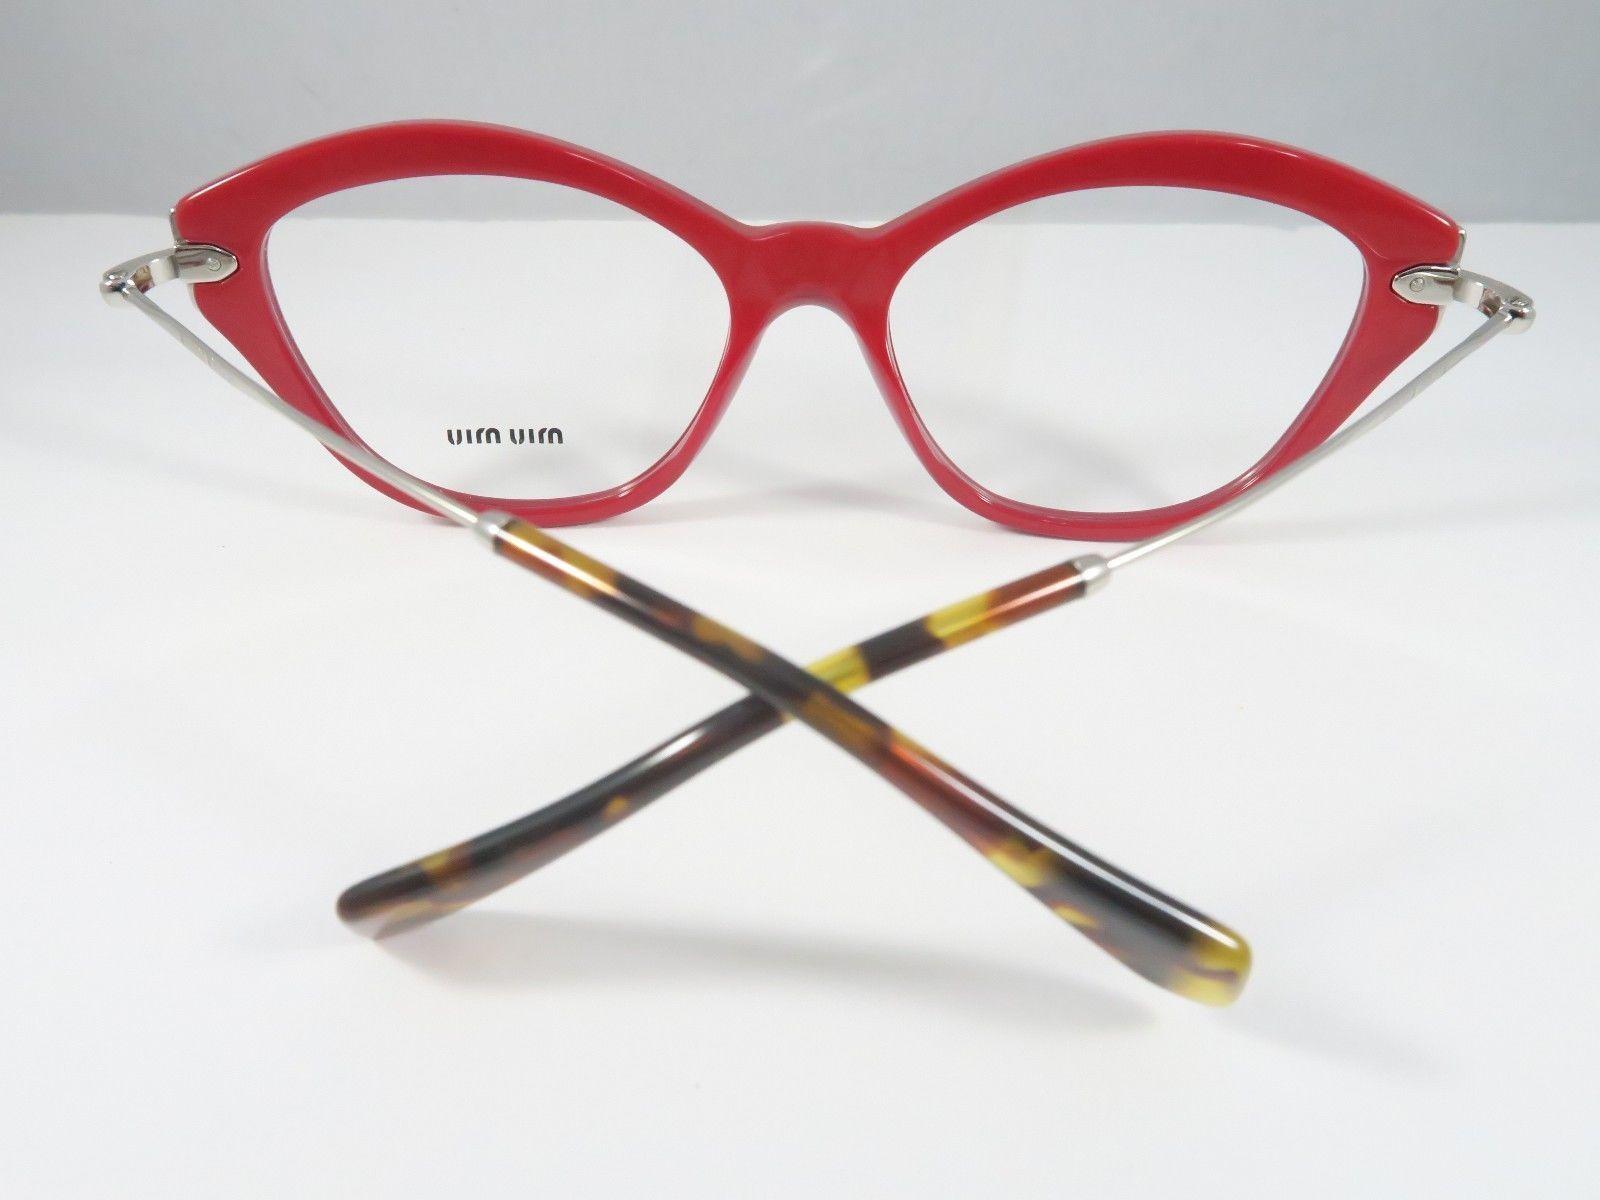 3e7e49833f72 Miu Miu VMU 02O UA4-1O1 Red   Silver   Havana New Authentic Eyeglasses 52mm